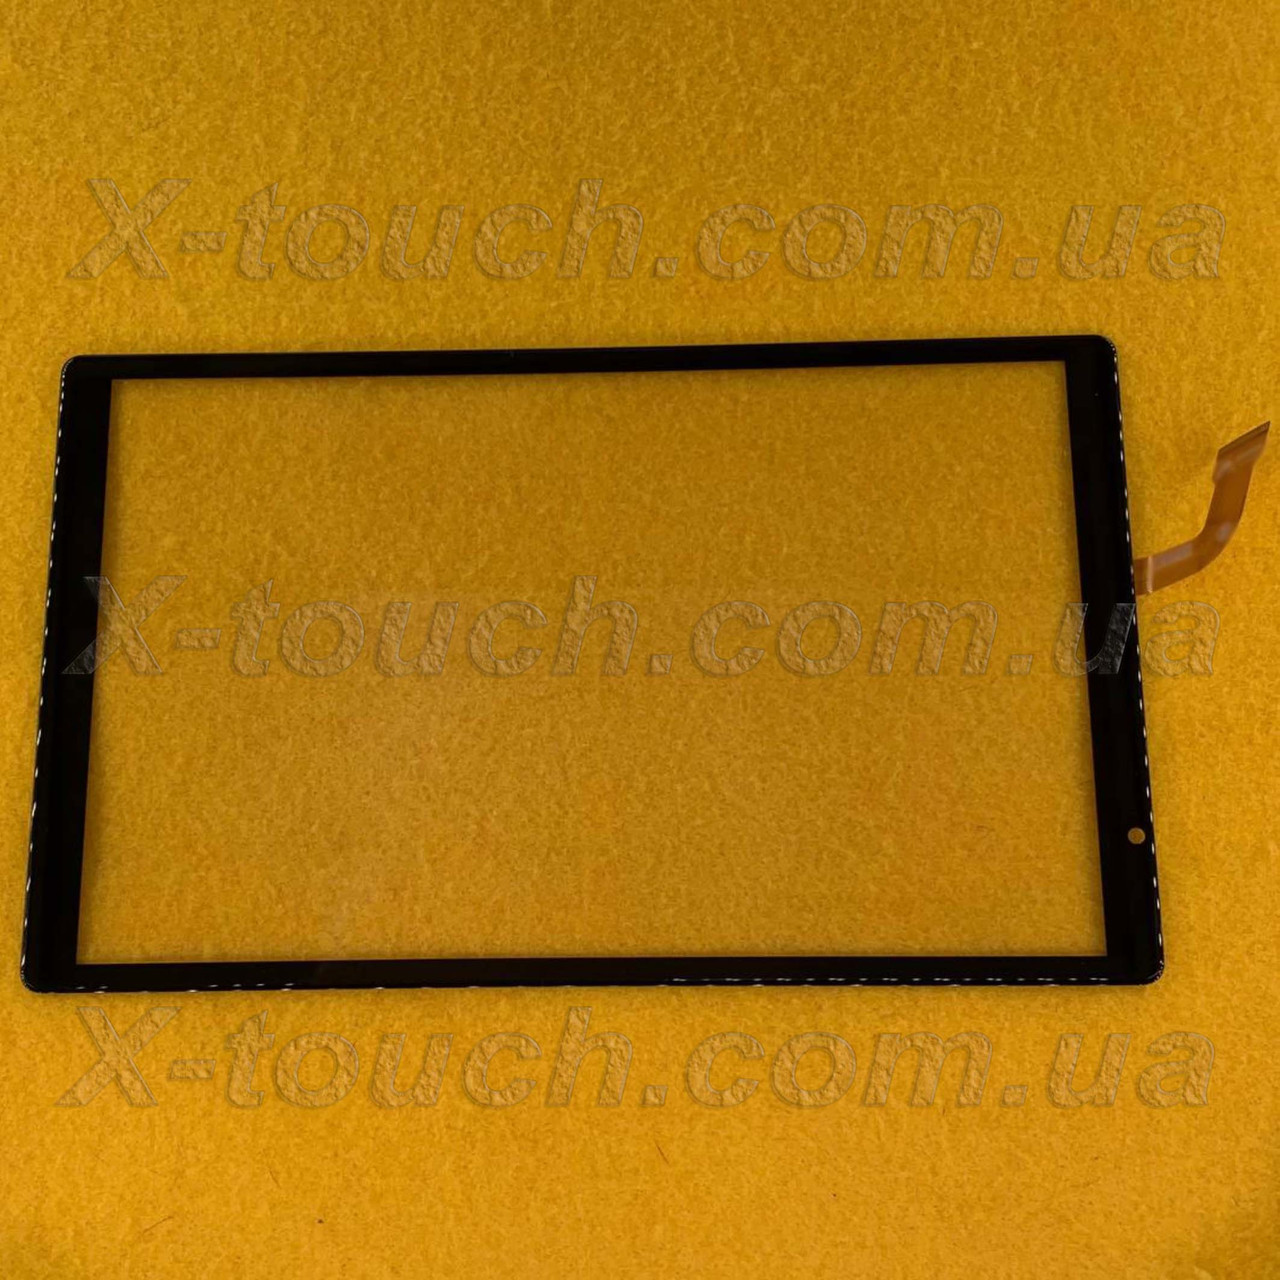 Тачскрин, сенсор MatrixPad S20 для планшета.